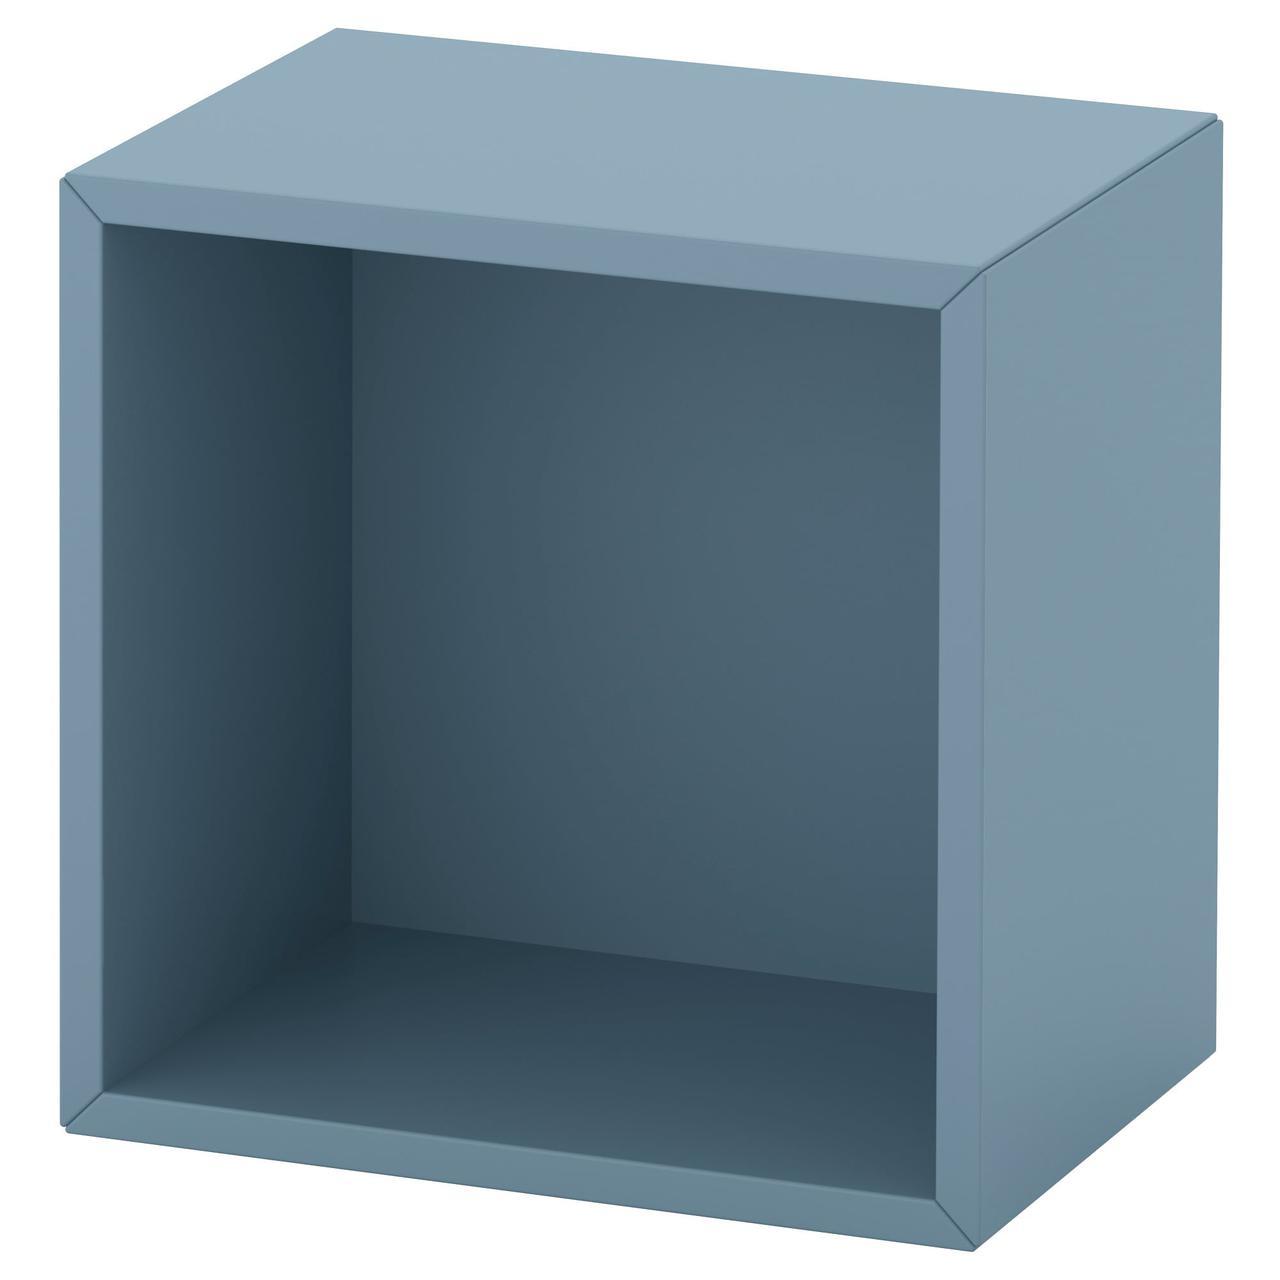 Полка настенная IKEA EKET 35x25x35 см голубая 392.858.51